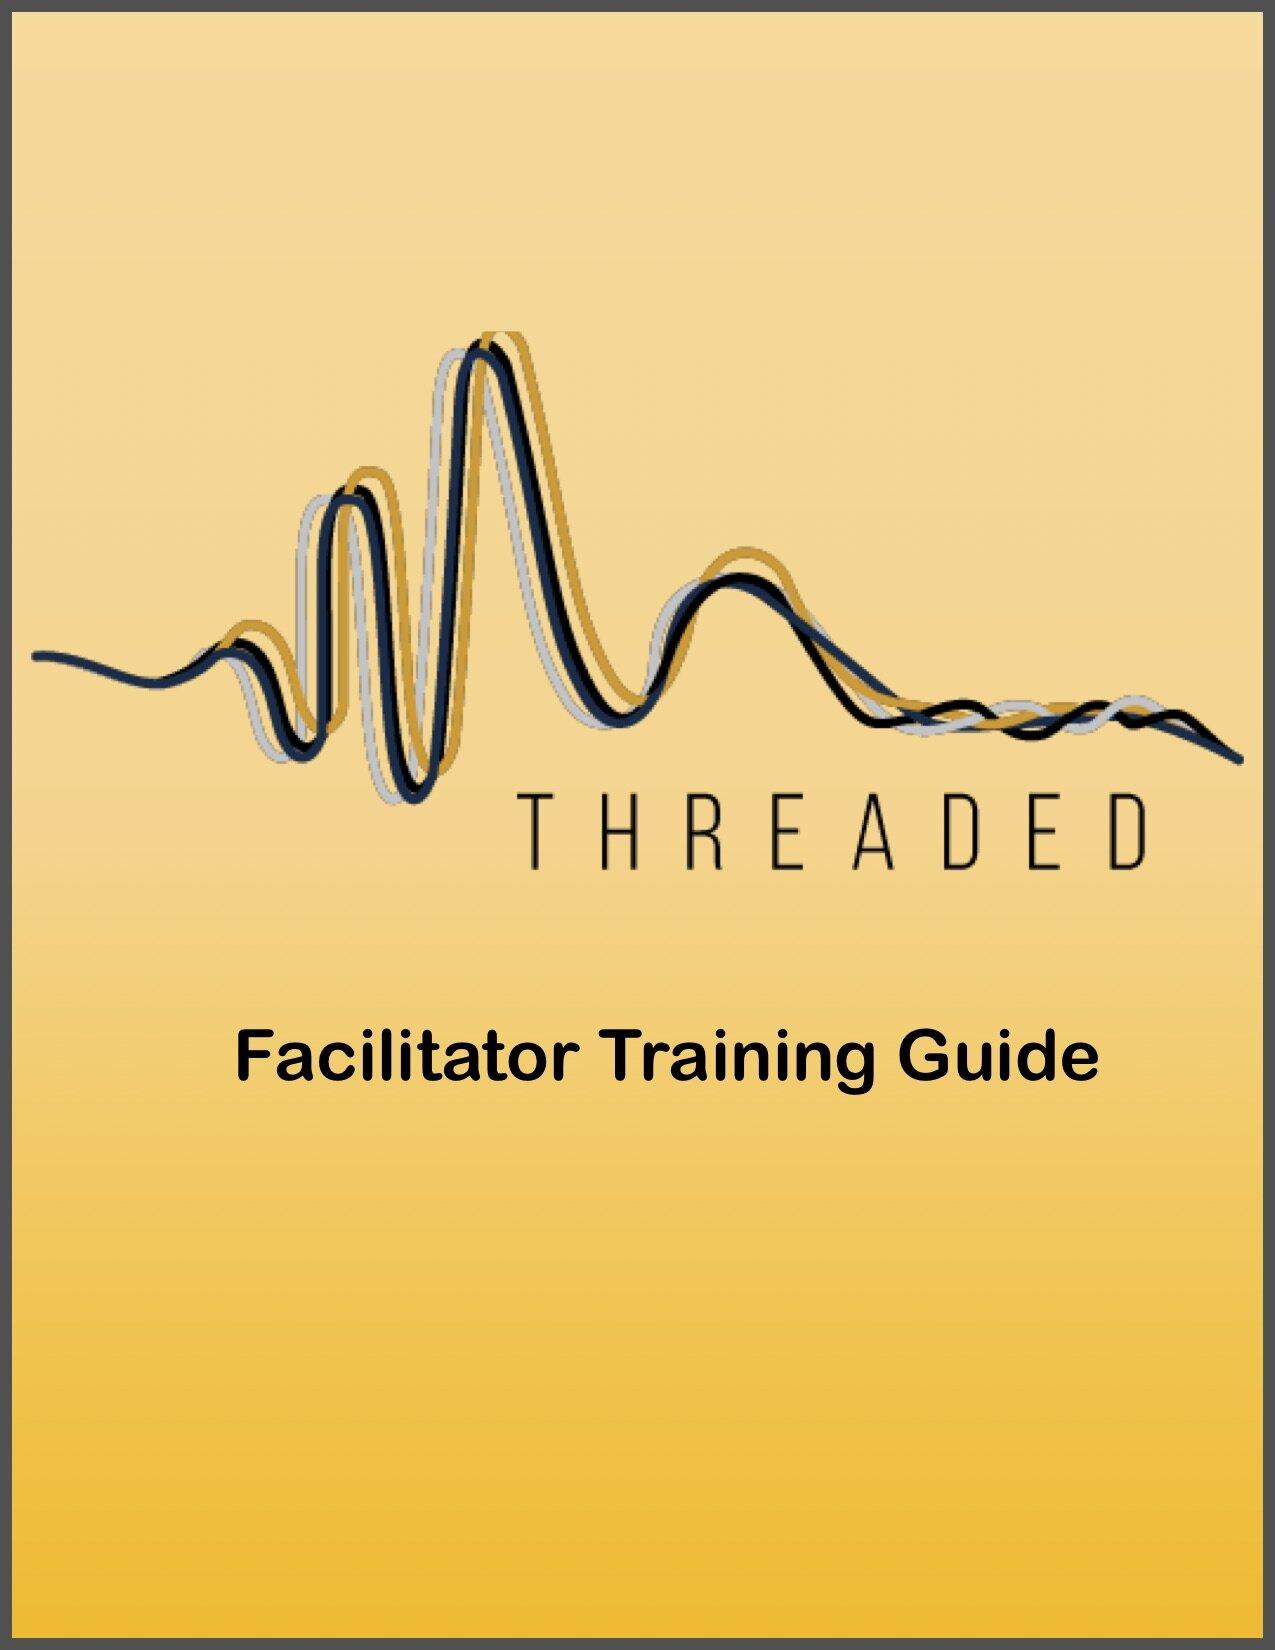 Facilitator Training Title page.jpg